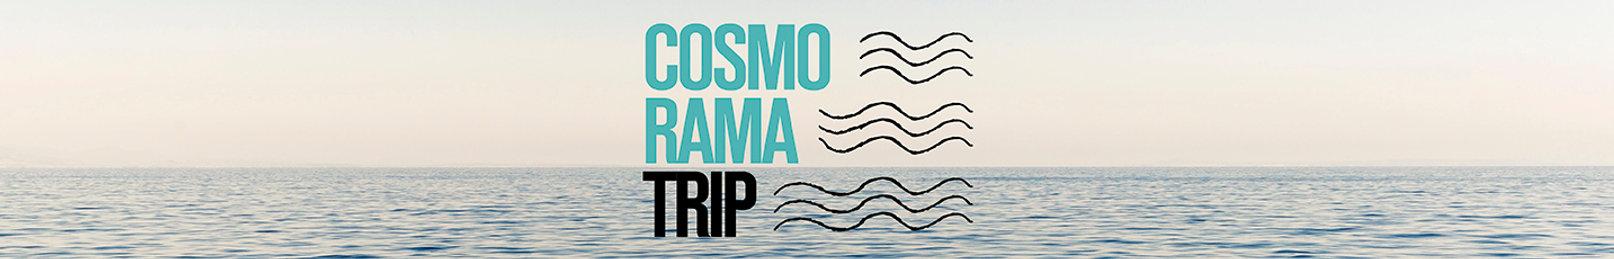 Cosmorama trip_site cover-01.jpg